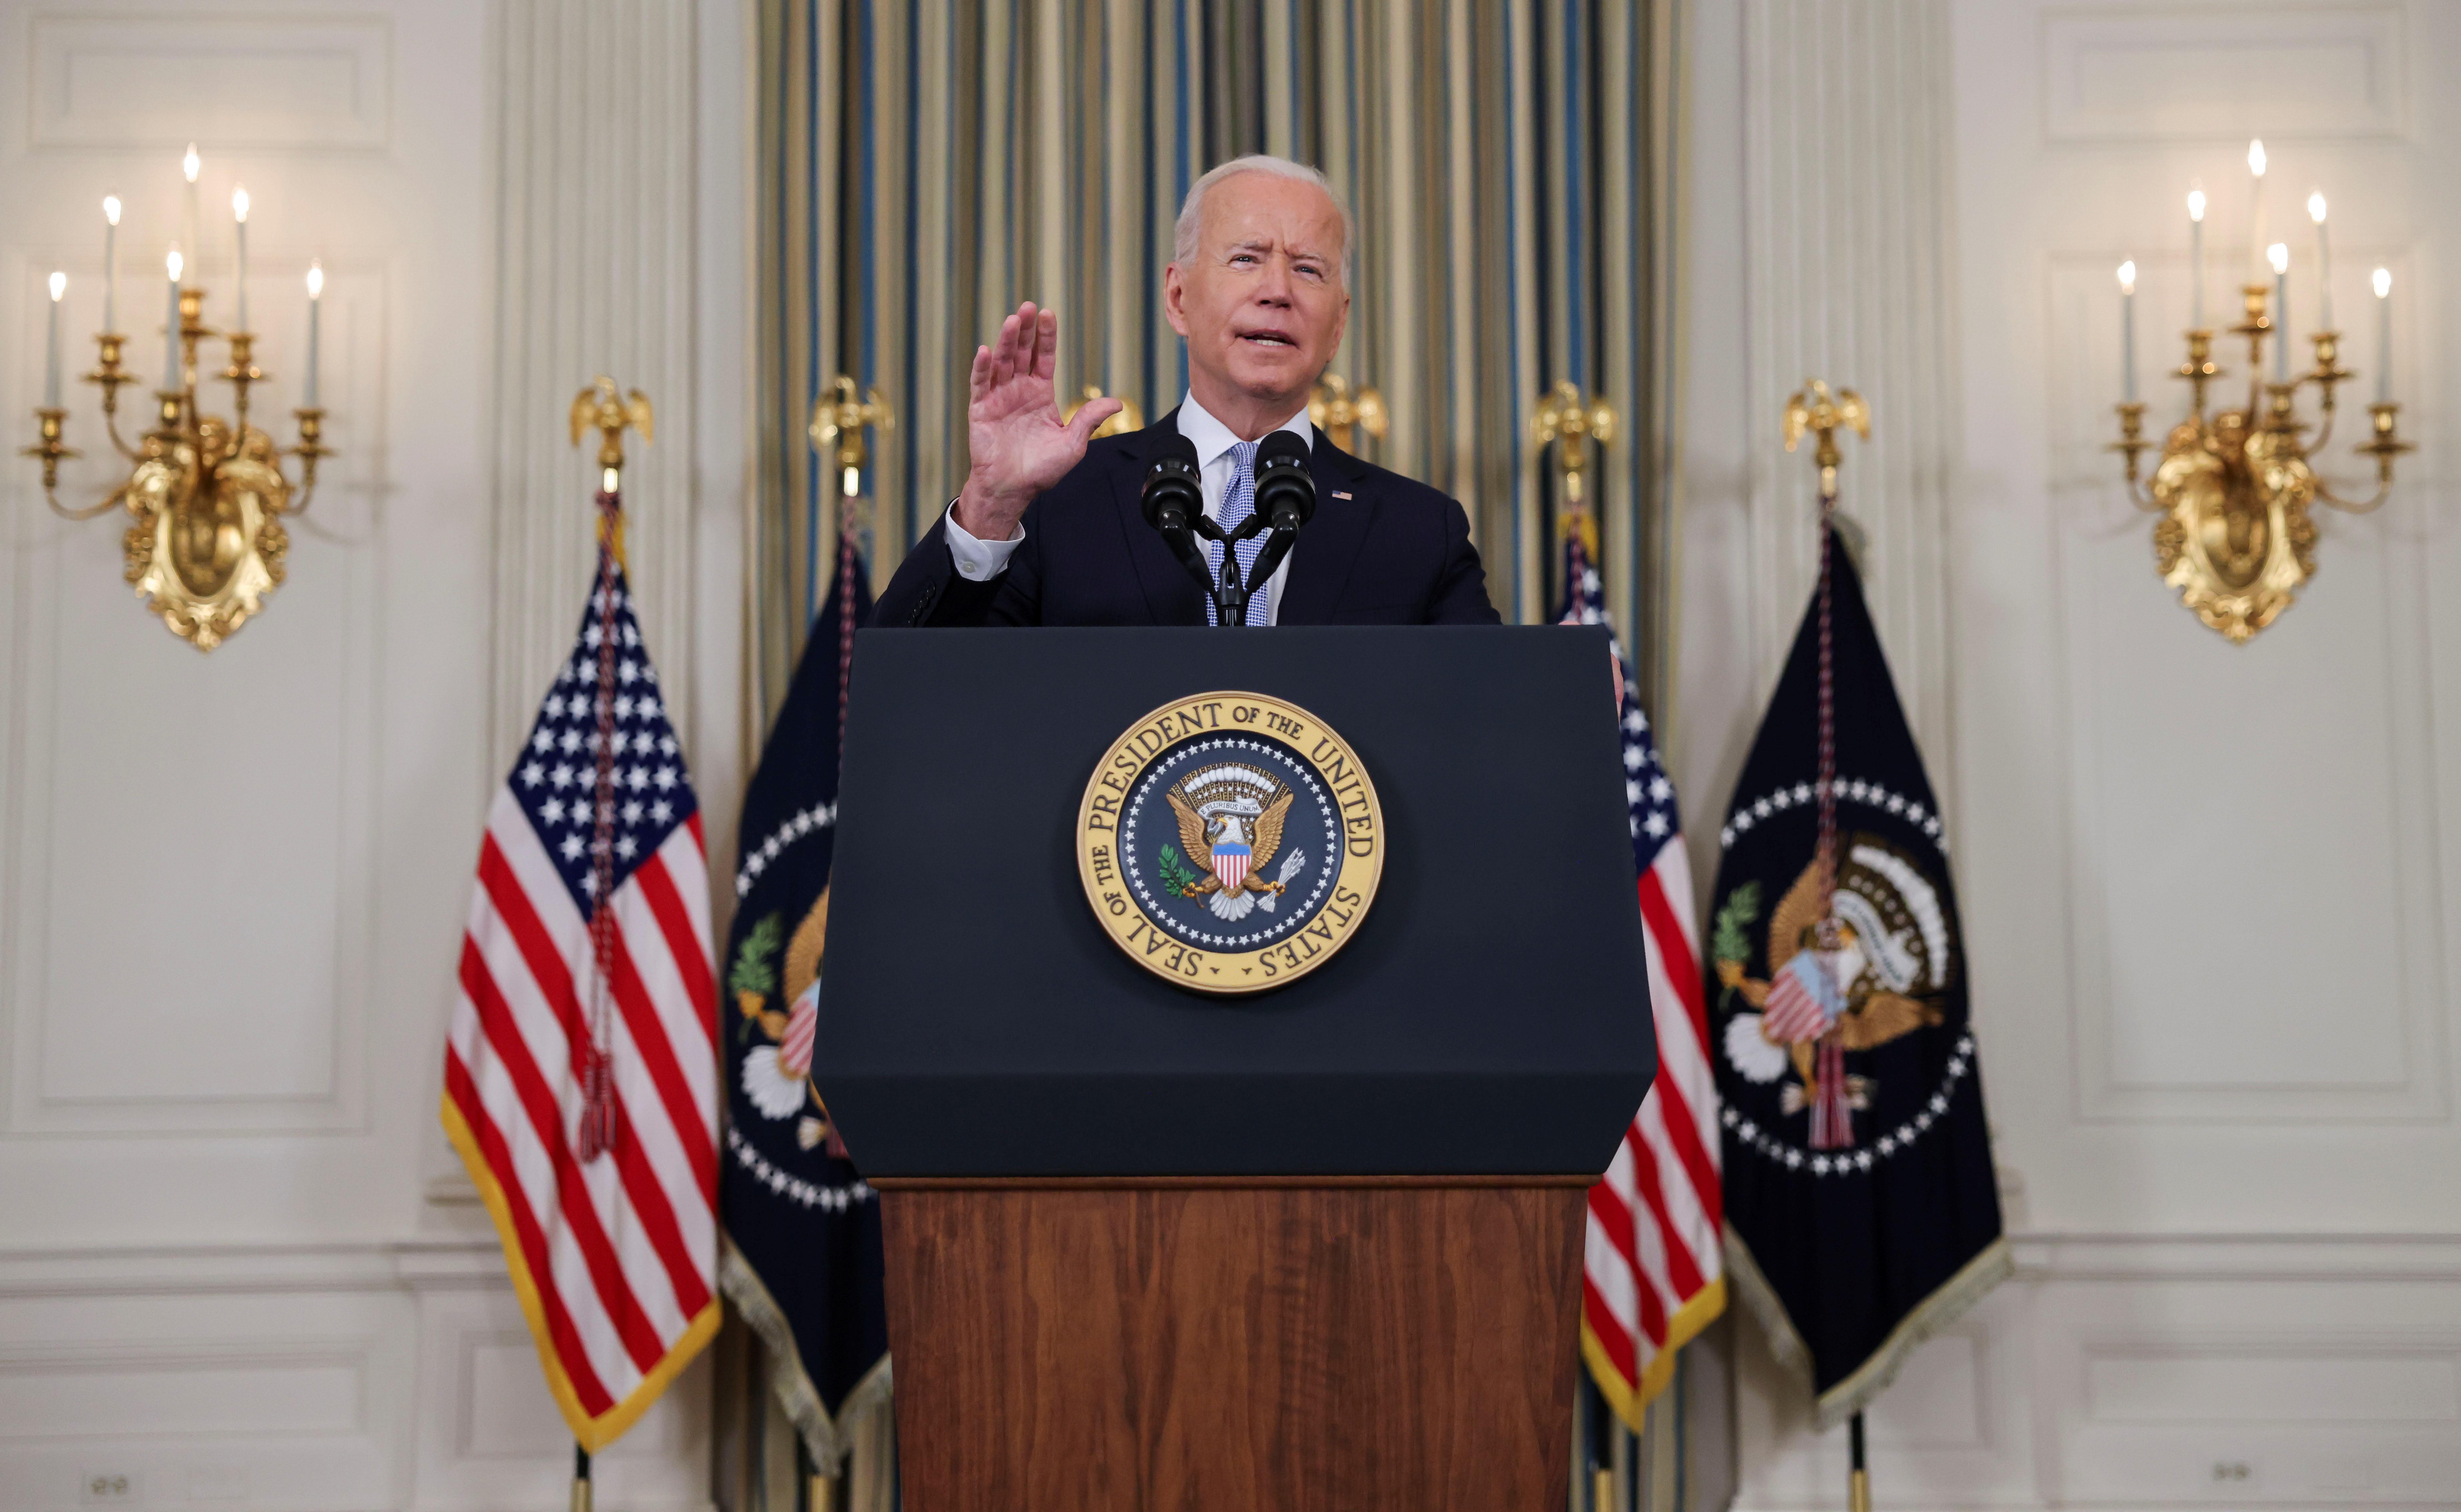 U.S. President Joe Biden. REUTERS/Evelyn Hockstein